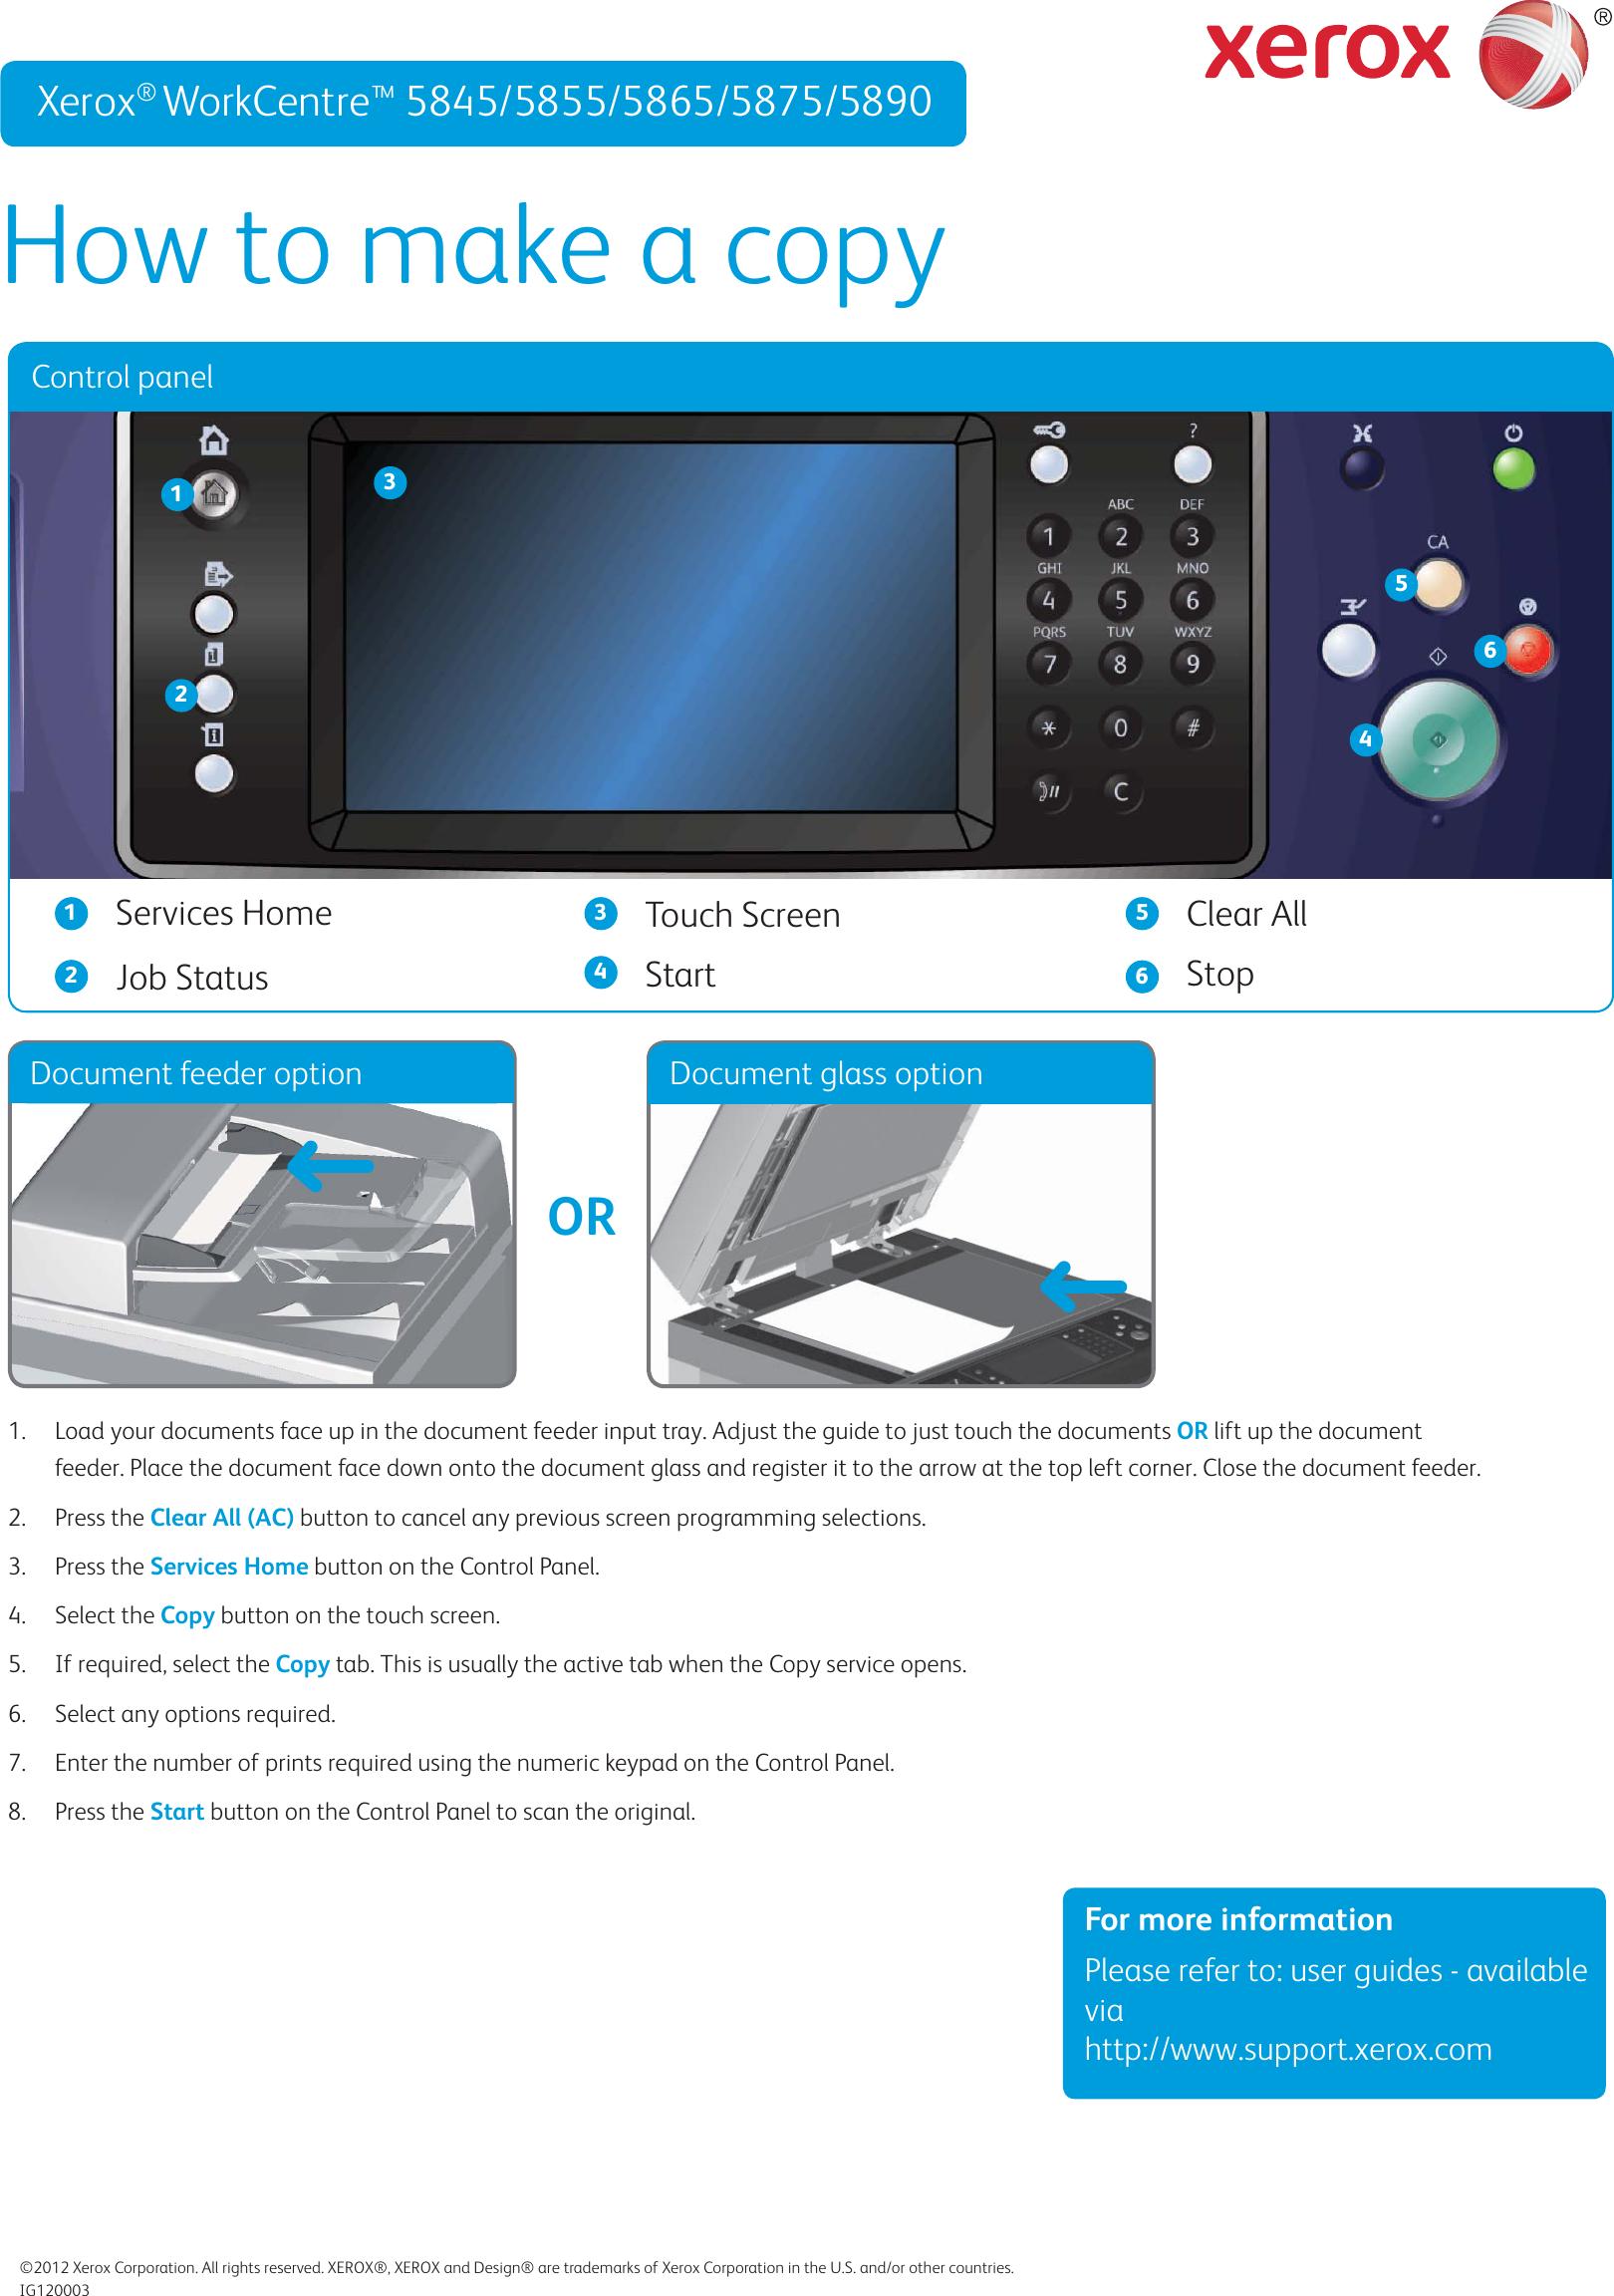 xerox workcentre 5845 5855 users manual ig120003 how to posters copy rh usermanual wiki xerox wc 5845 service manual xerox wc 5845 service manual